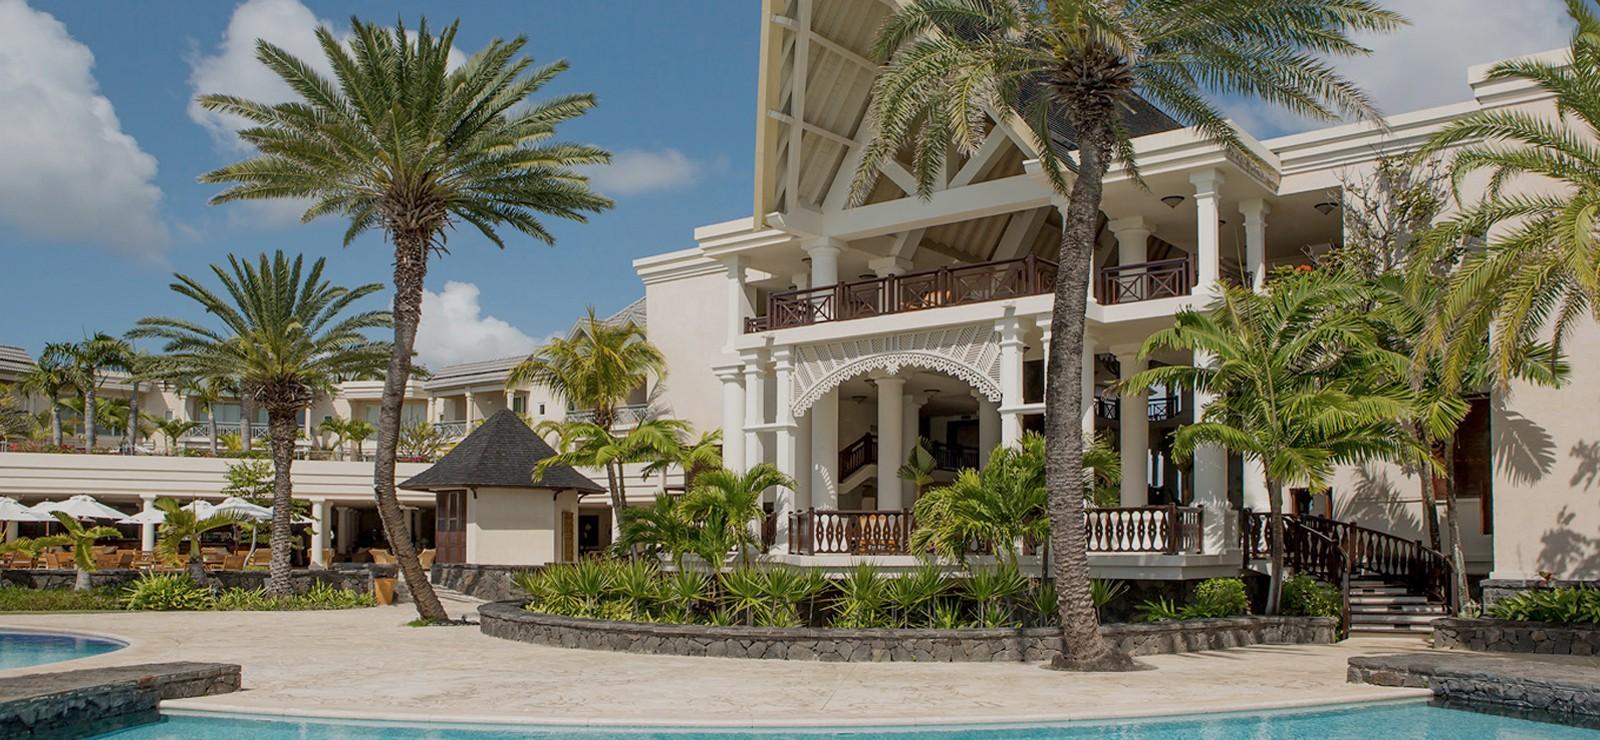 residence mauritius honeymoon packages header